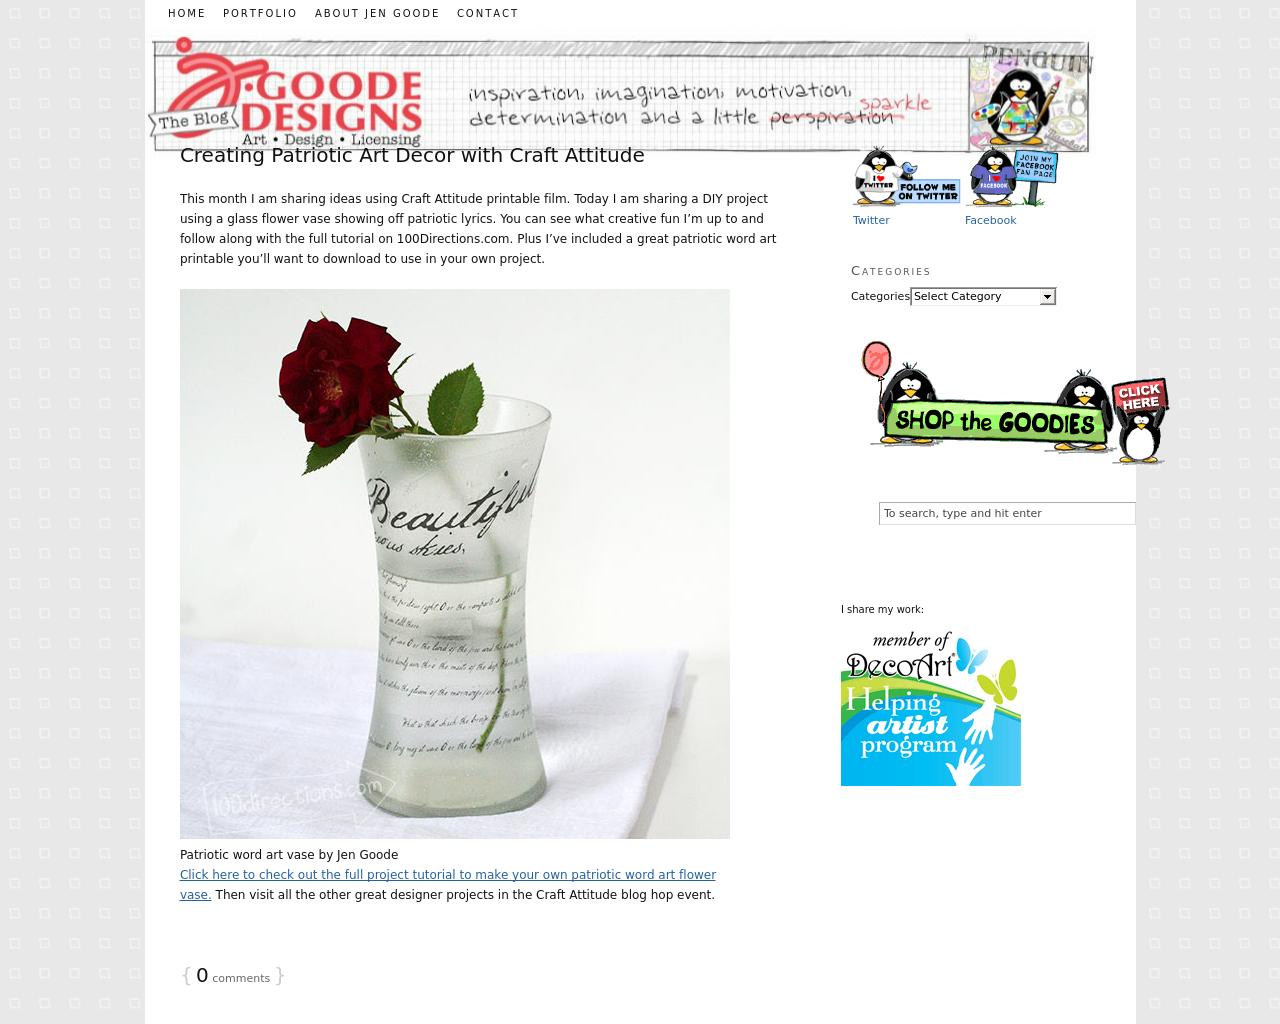 Jgoode.com-Advertising-Reviews-Pricing